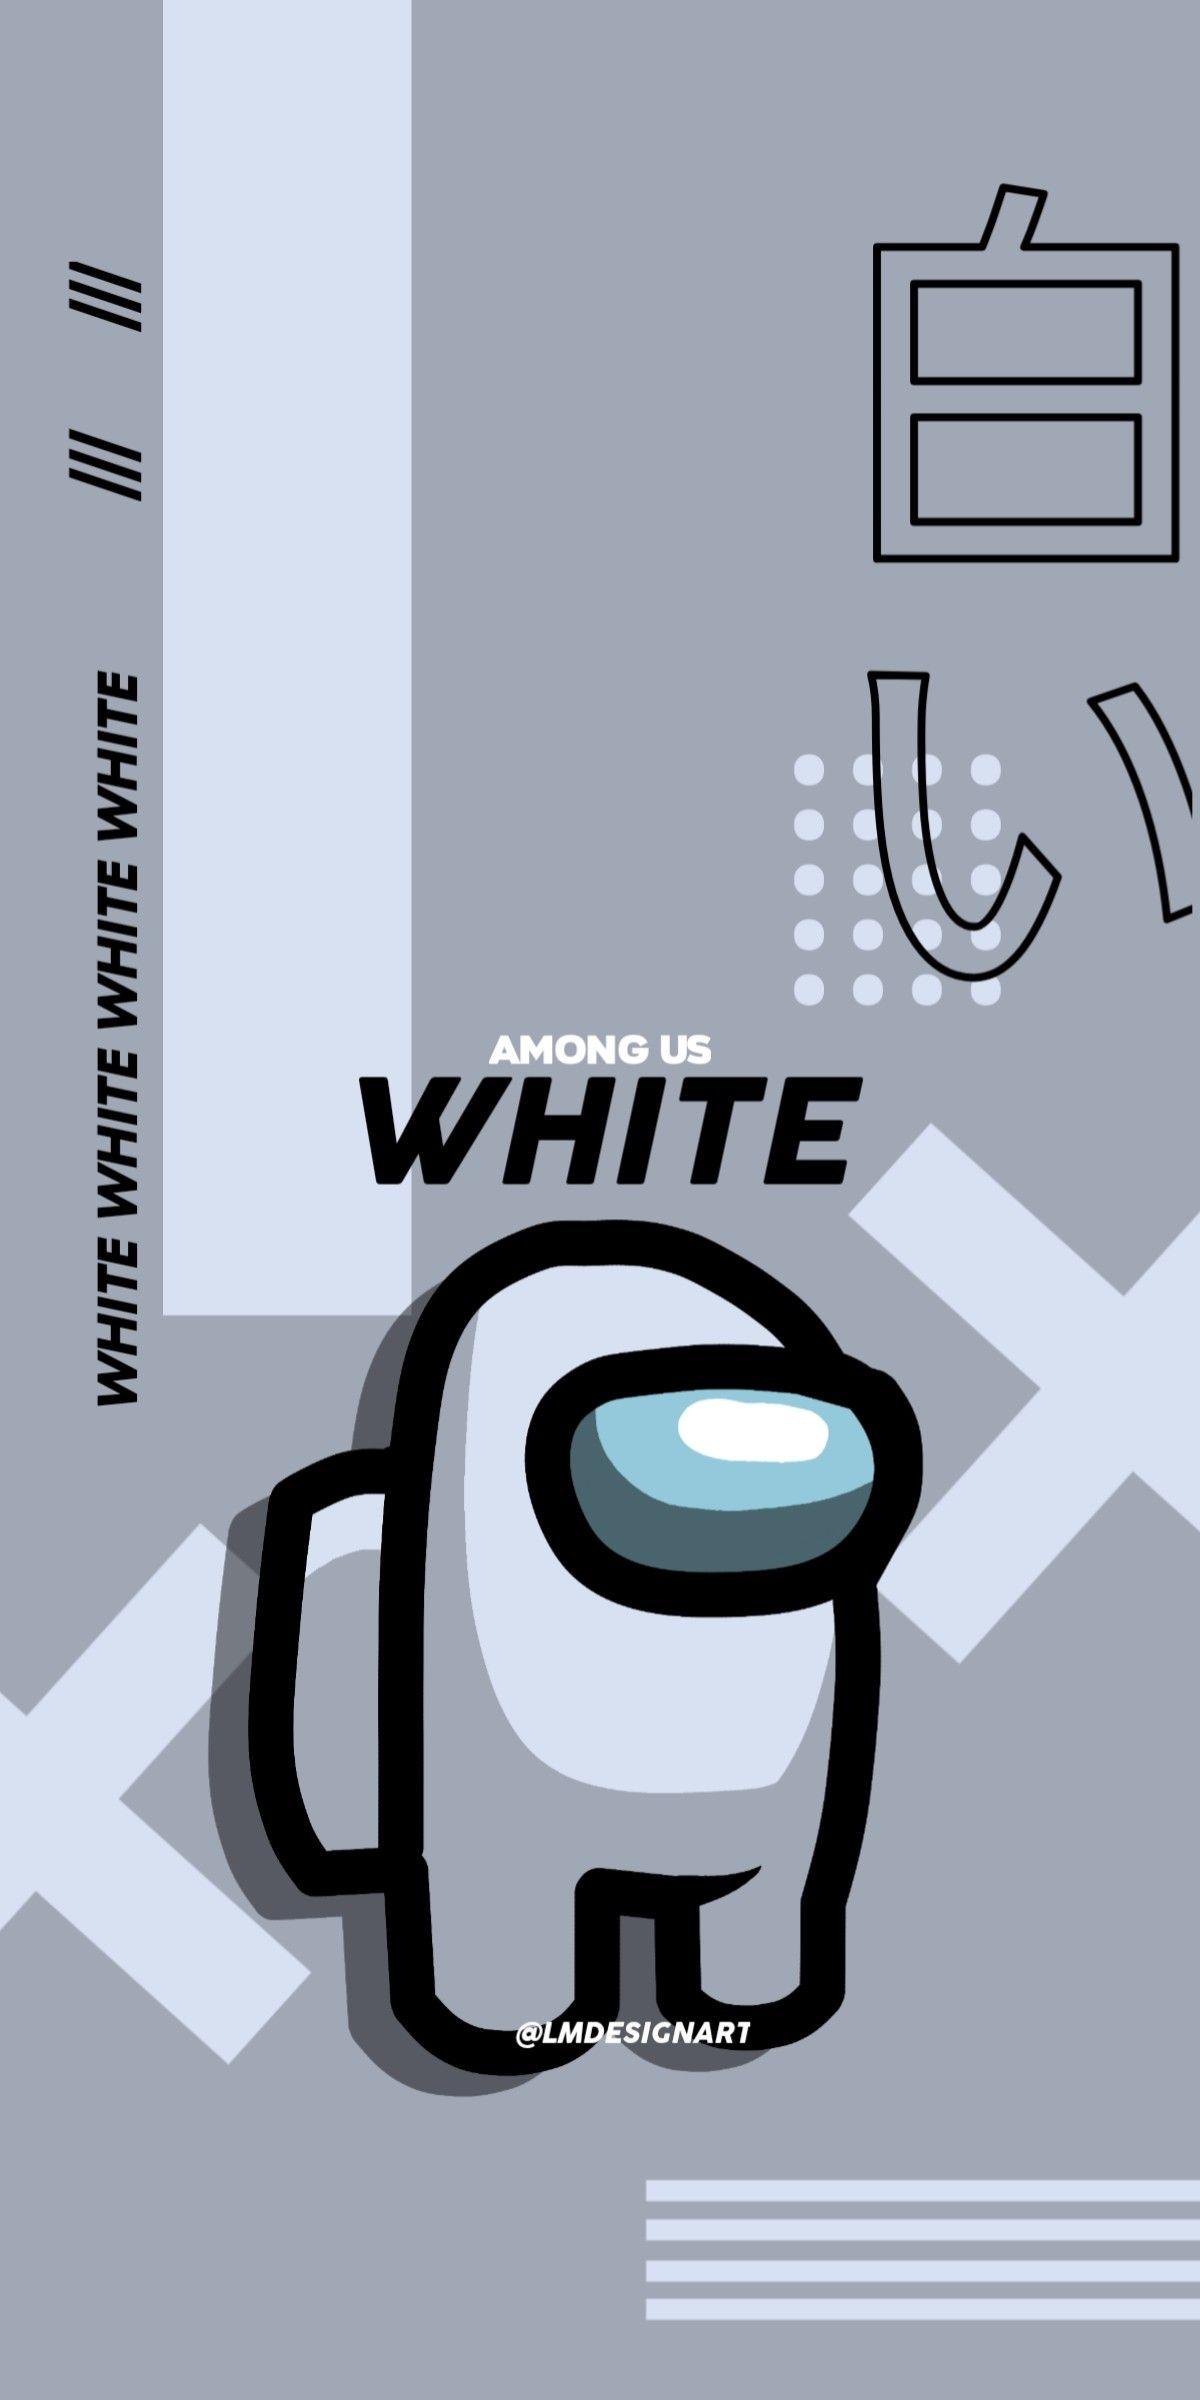 Among Us White Cute Cartoon Wallpapers Funny Phone Wallpaper Cute Patterns Wallpaper